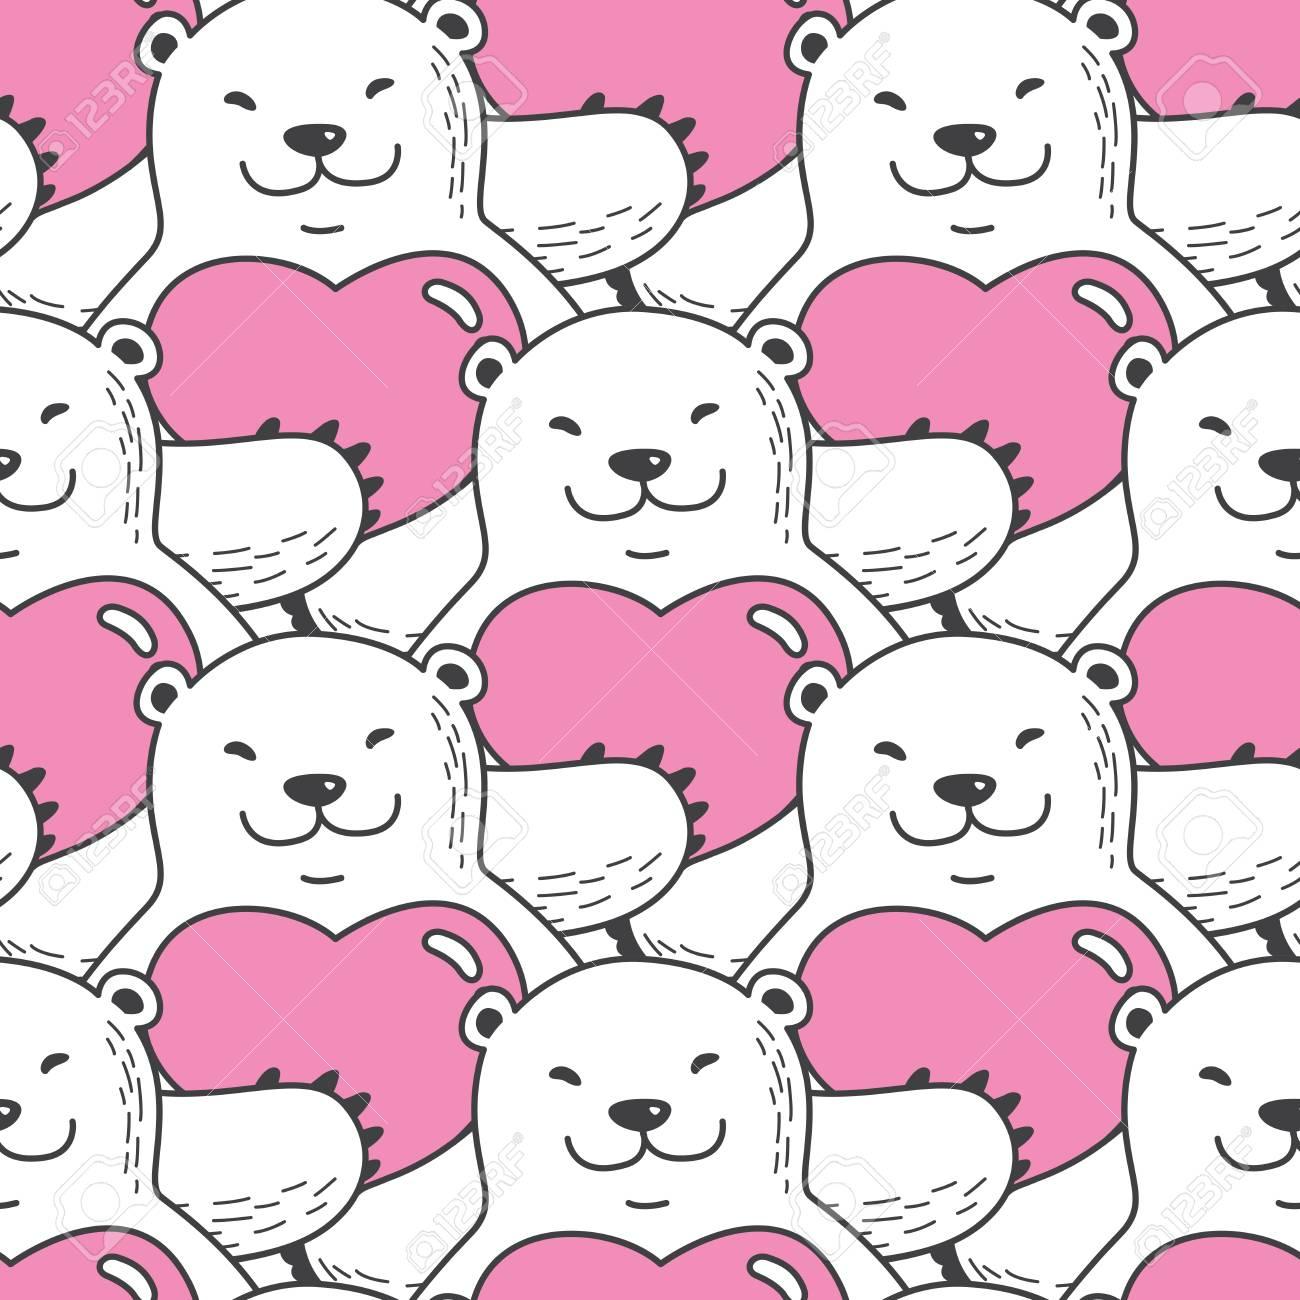 Bear Polar Bear Seamless Pattern Vector Hug Heart Valentine Isolated Royalty Free Cliparts Vectors And Stock Illustration Image 94832639